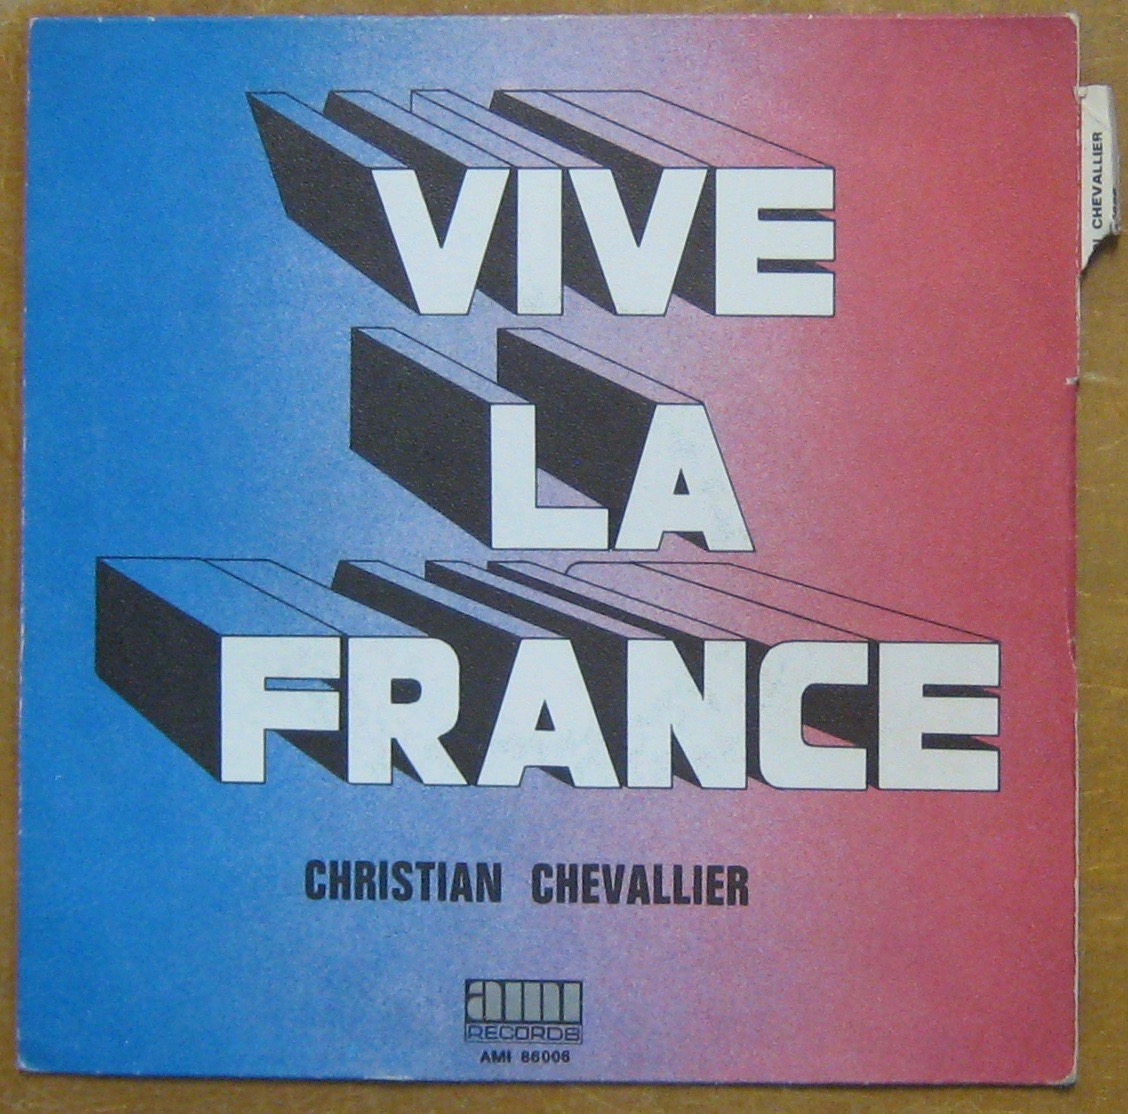 CHEVALLIER CHRISTIAN - Vive la France - 7inch (SP)